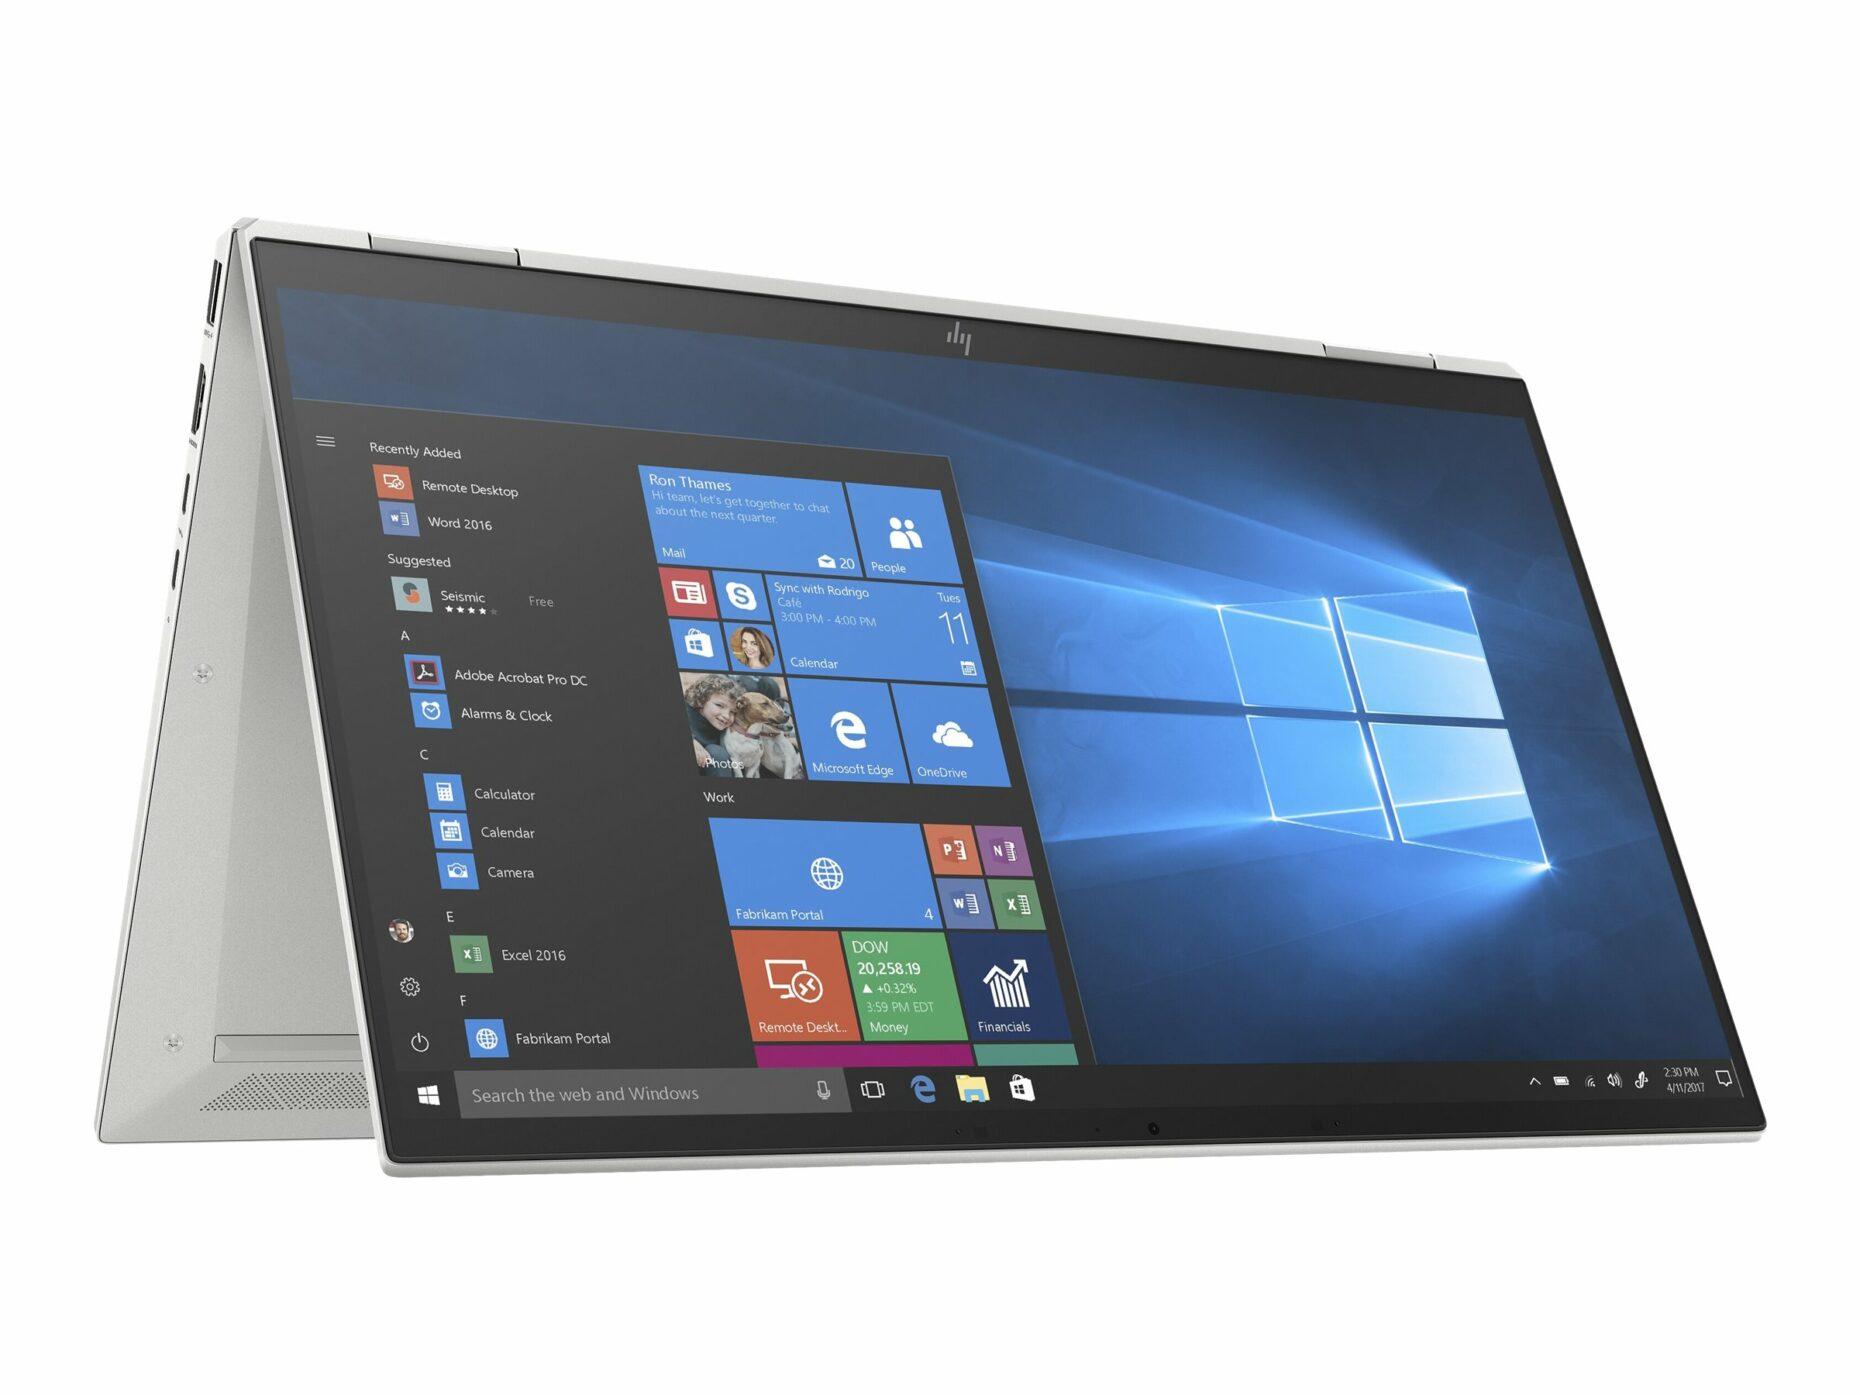 "HP EliteBook 1040 G7 - Flip design - Core i5 10310U - Windows 10 Pro - 8 GB RAM - 256 GB SSD - 14"" touchscreen (Full HD) - UHD Graphics - Notebook"